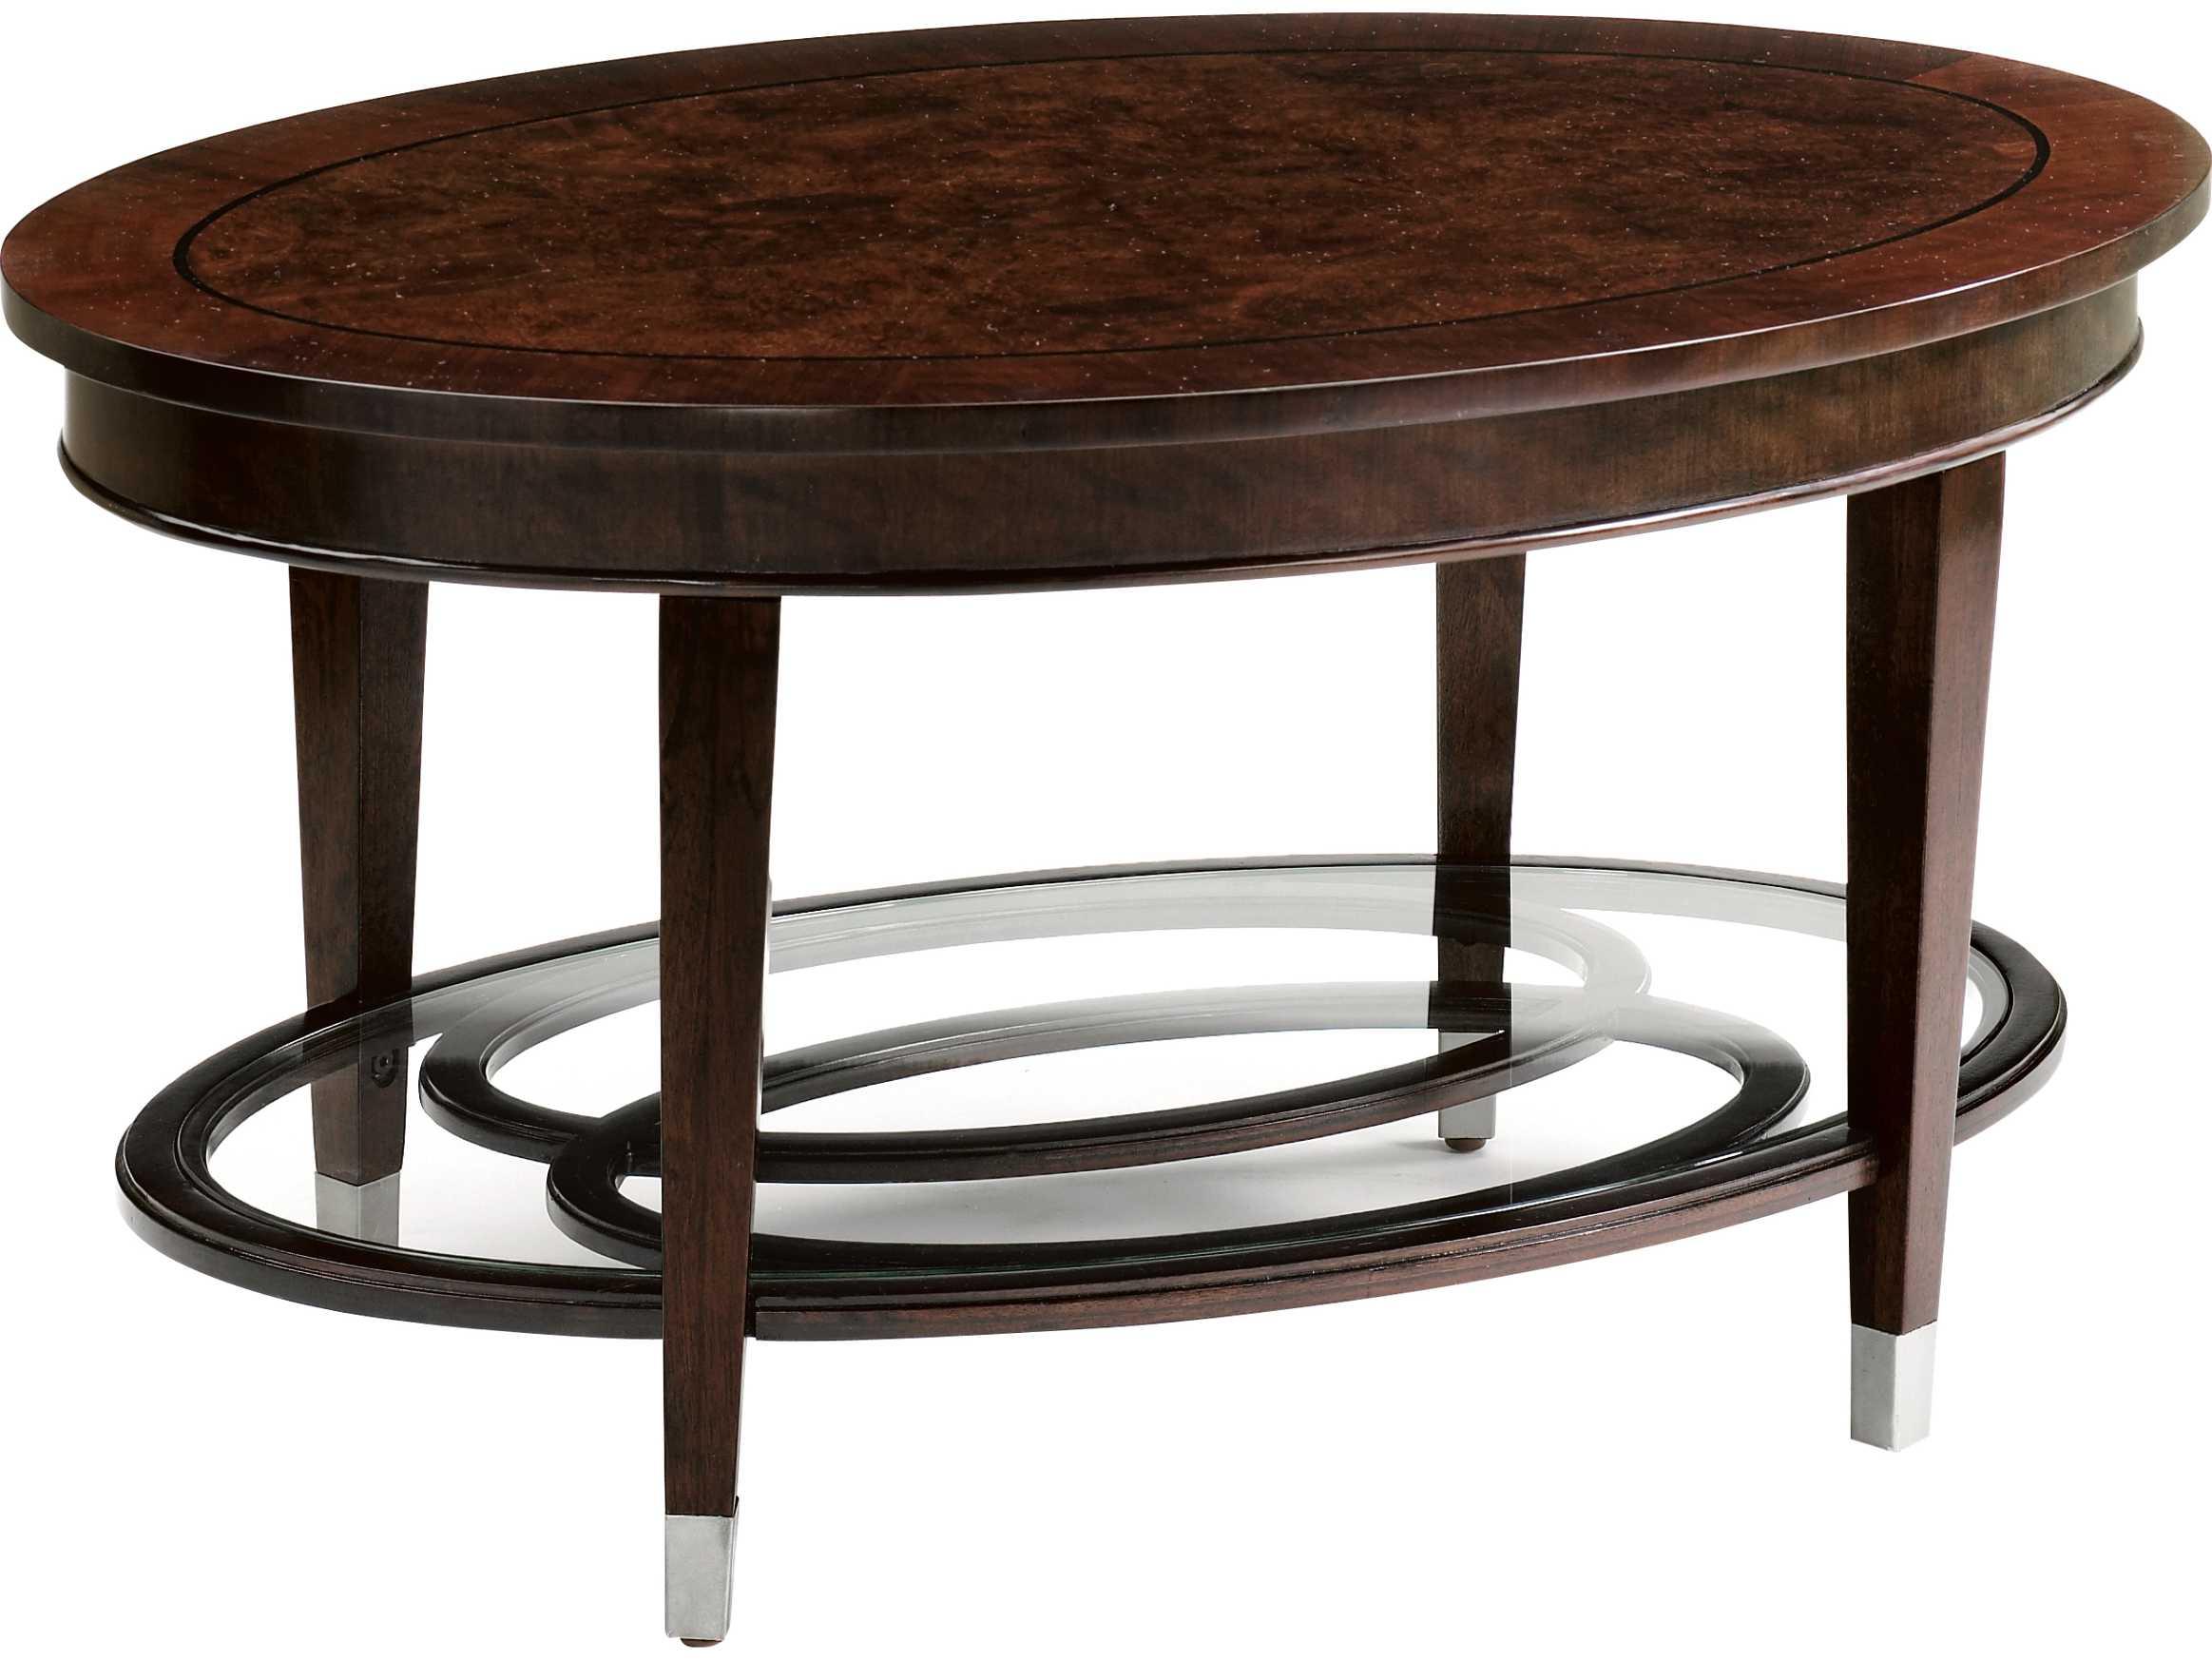 Hekman Paris 38 X 24 Oval Coffee Table 1 1201